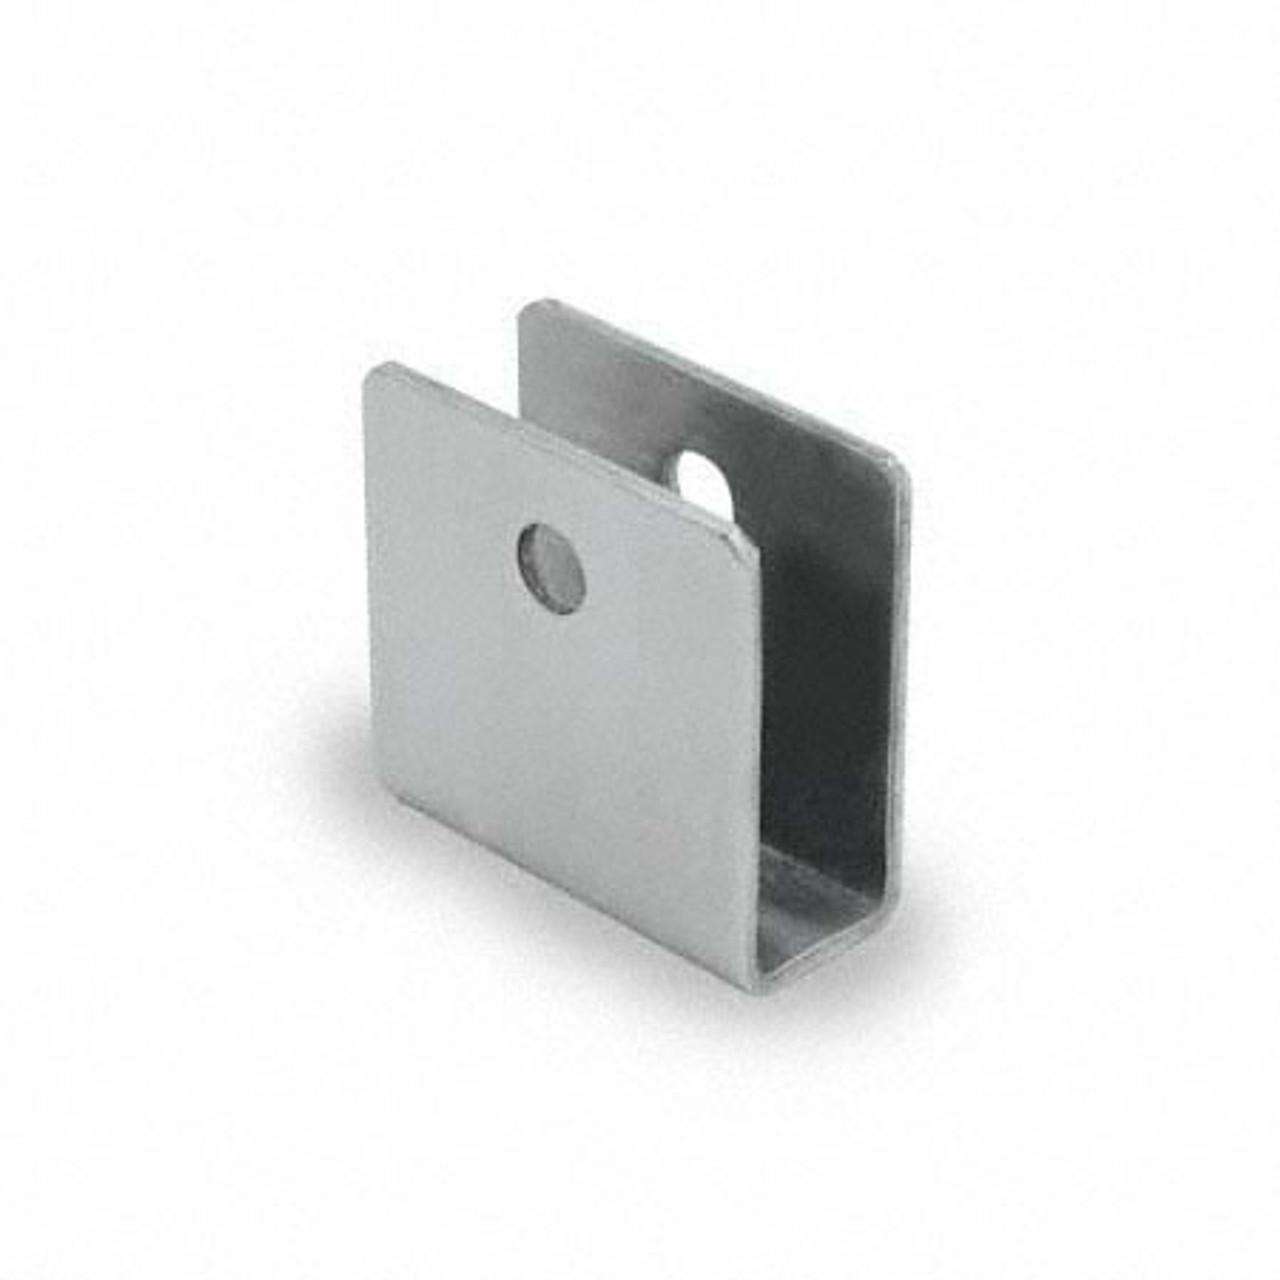 "1/2"" Stamped Stainless Steel U-Bracket (4030.5SS)"